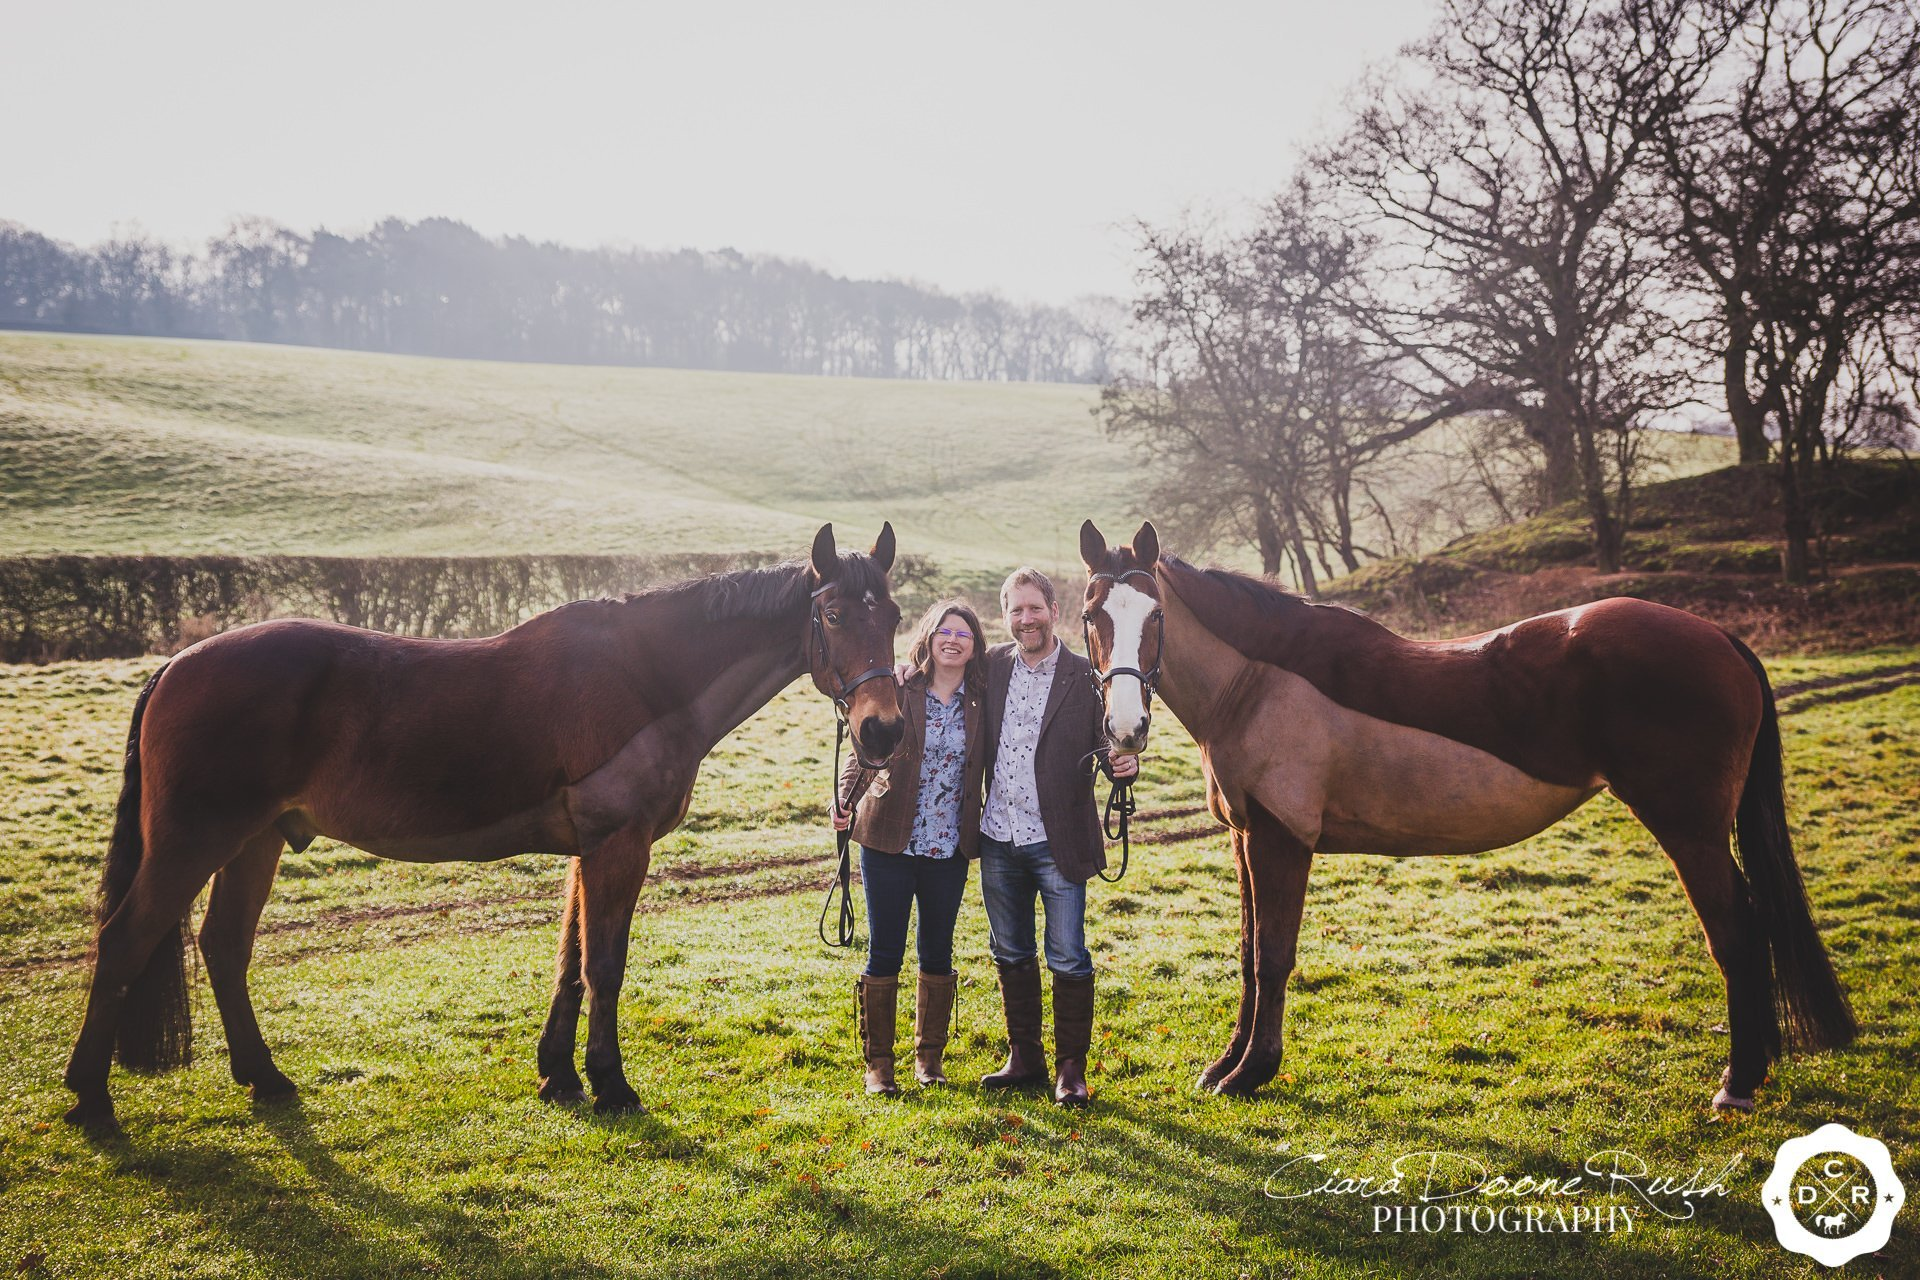 A Couple & Horses Photo Shoot // Sam & Brent // February 2019